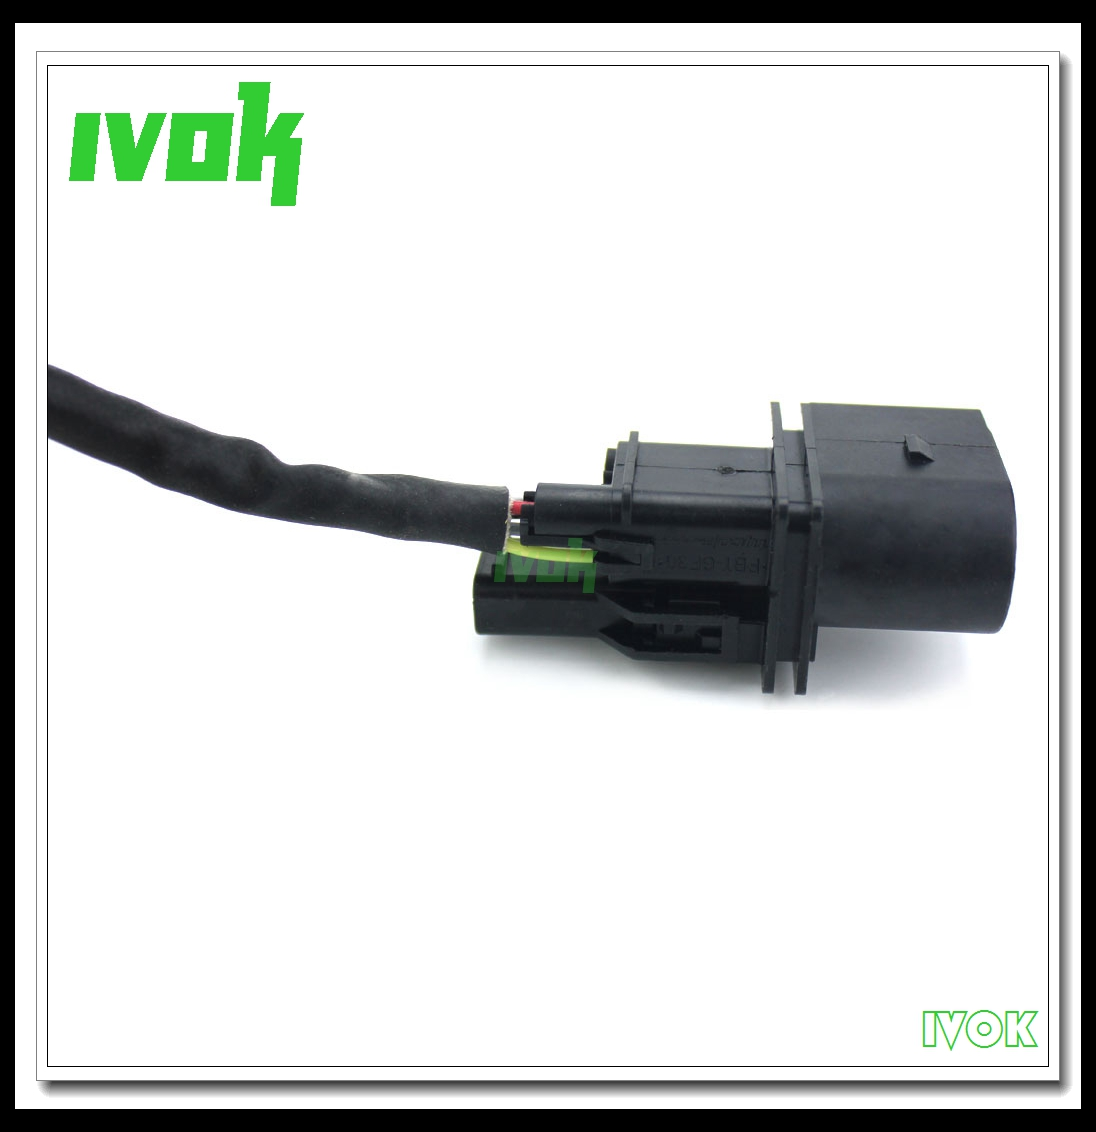 High Quality 5 Wire Oxygen Sensor For Audi A4 Tt Volkswagen Vw Golf 1999 Eurovan Ac Wiring Jetta Beetle Passat T 3000 0258007285 In Exhaust Gas From